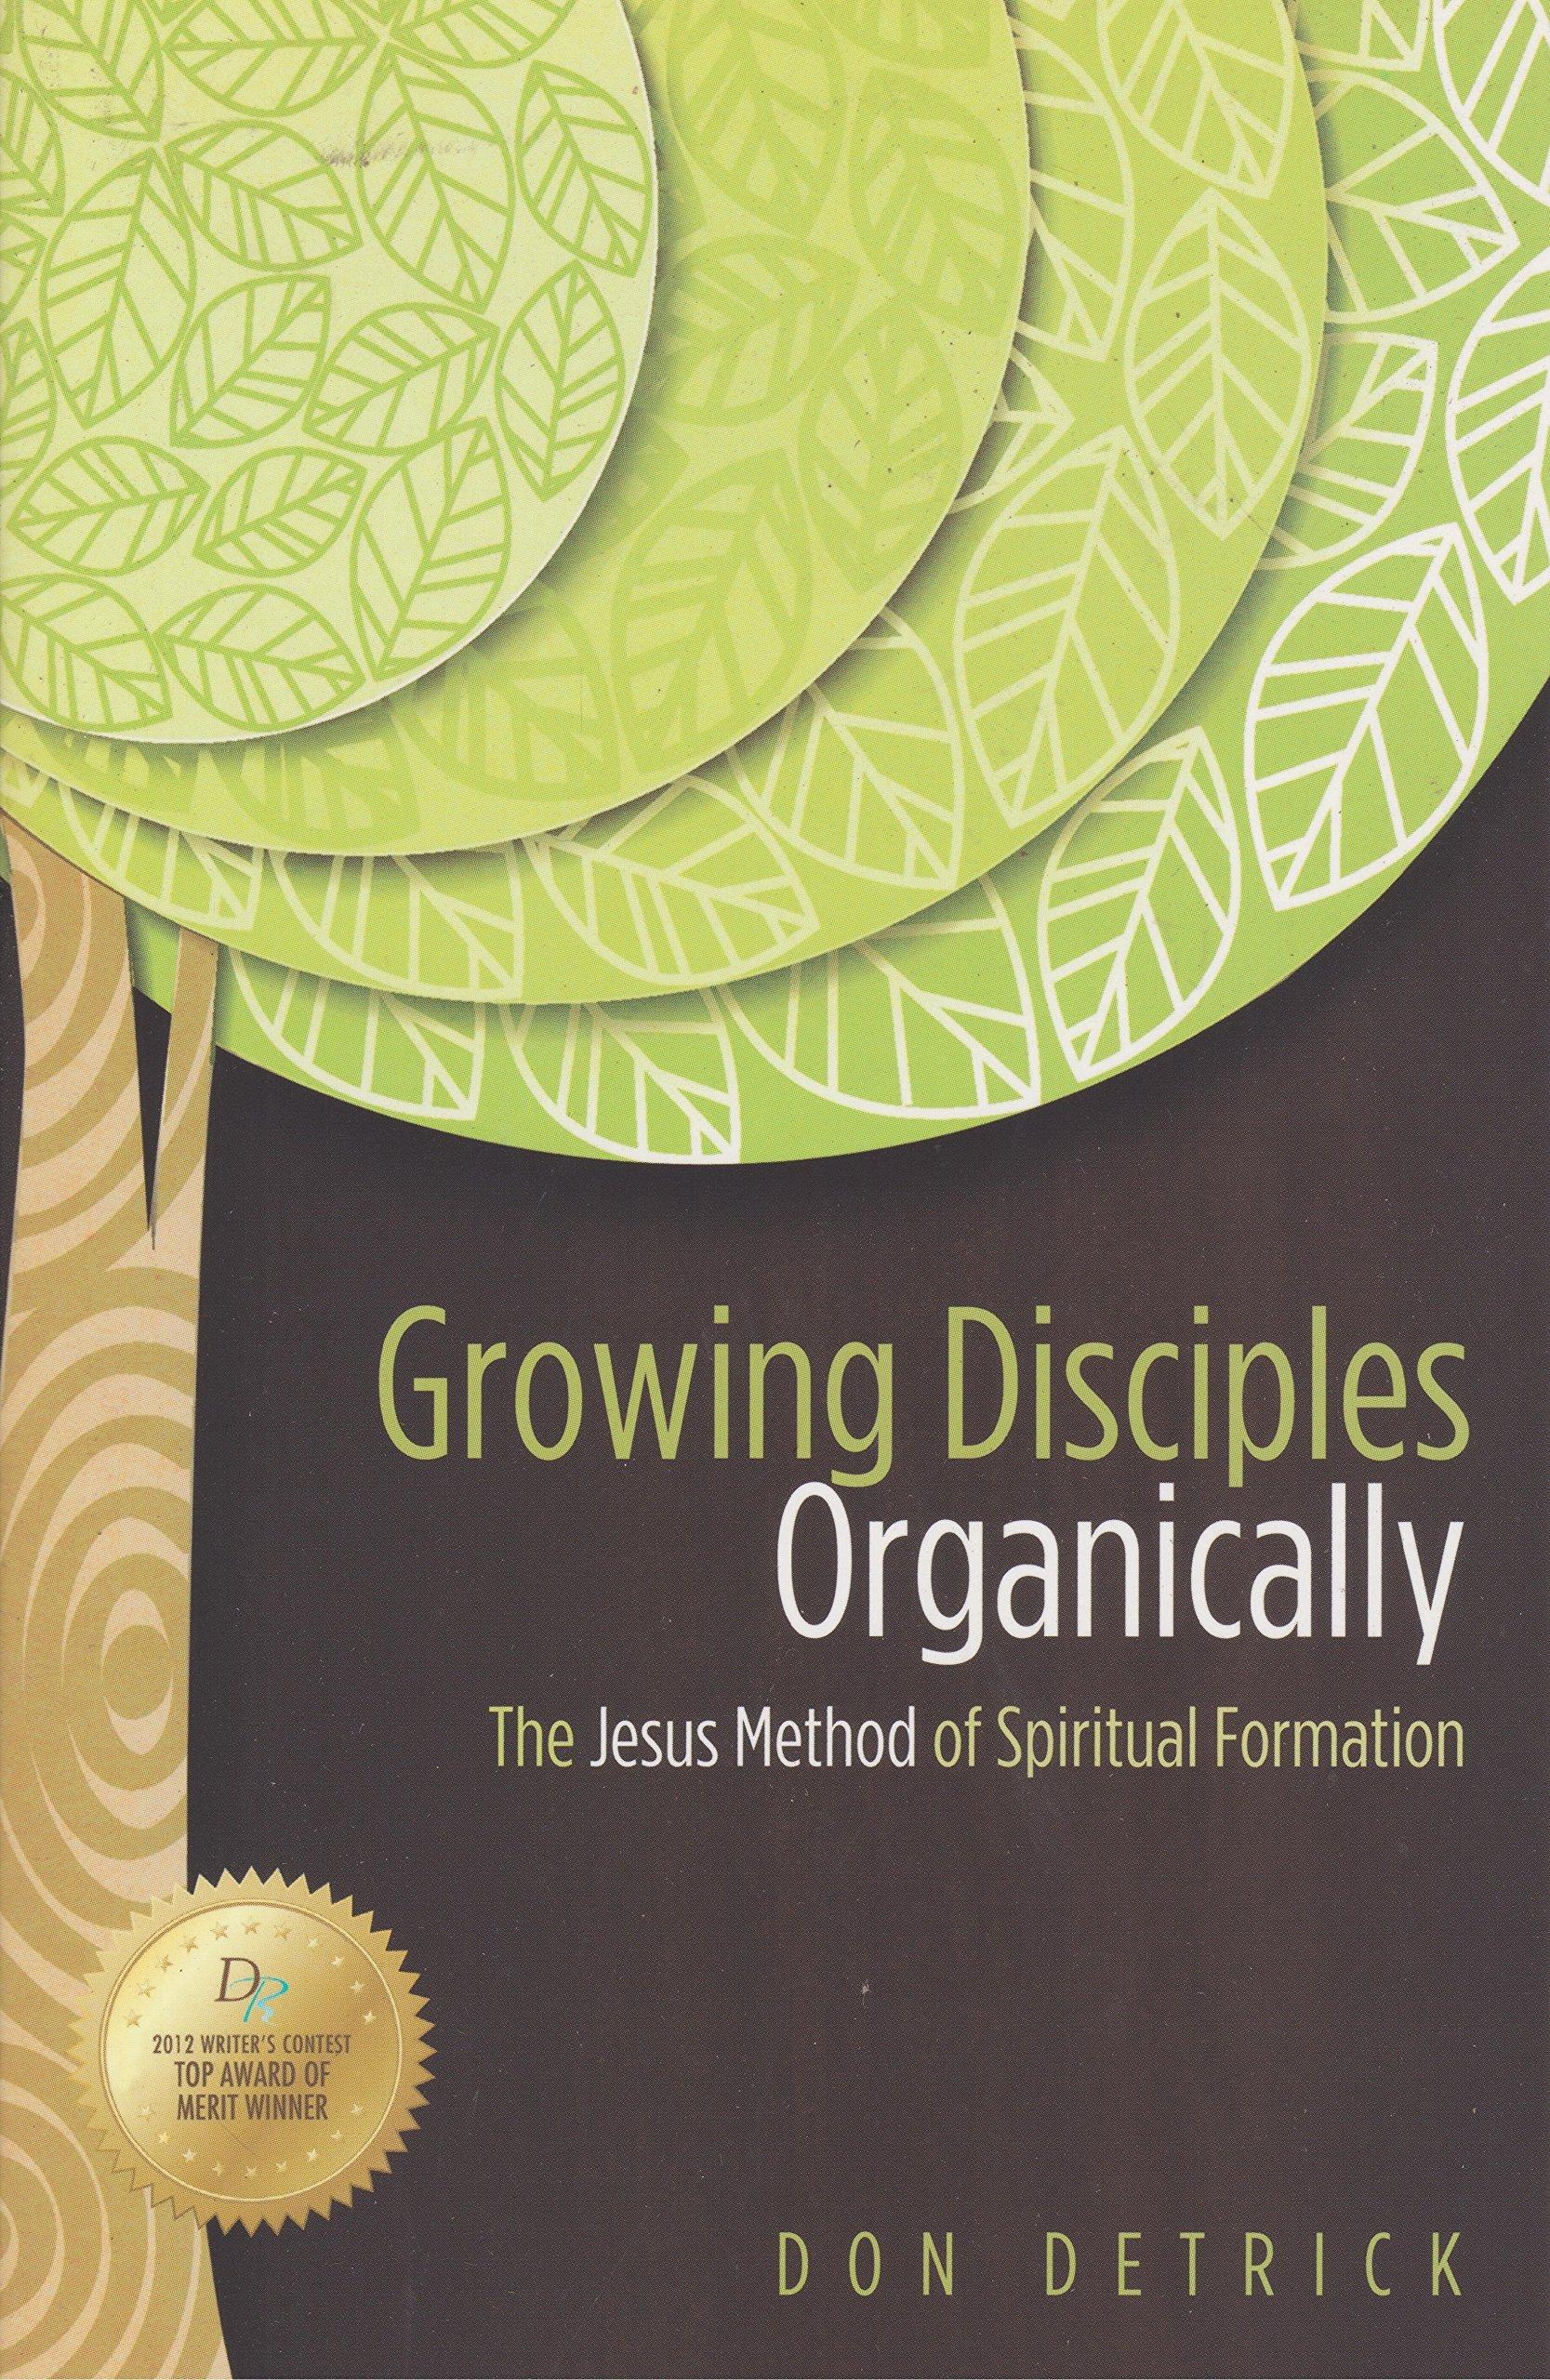 Growing Disciples Organically: The Jesus Method of Spiritual ...